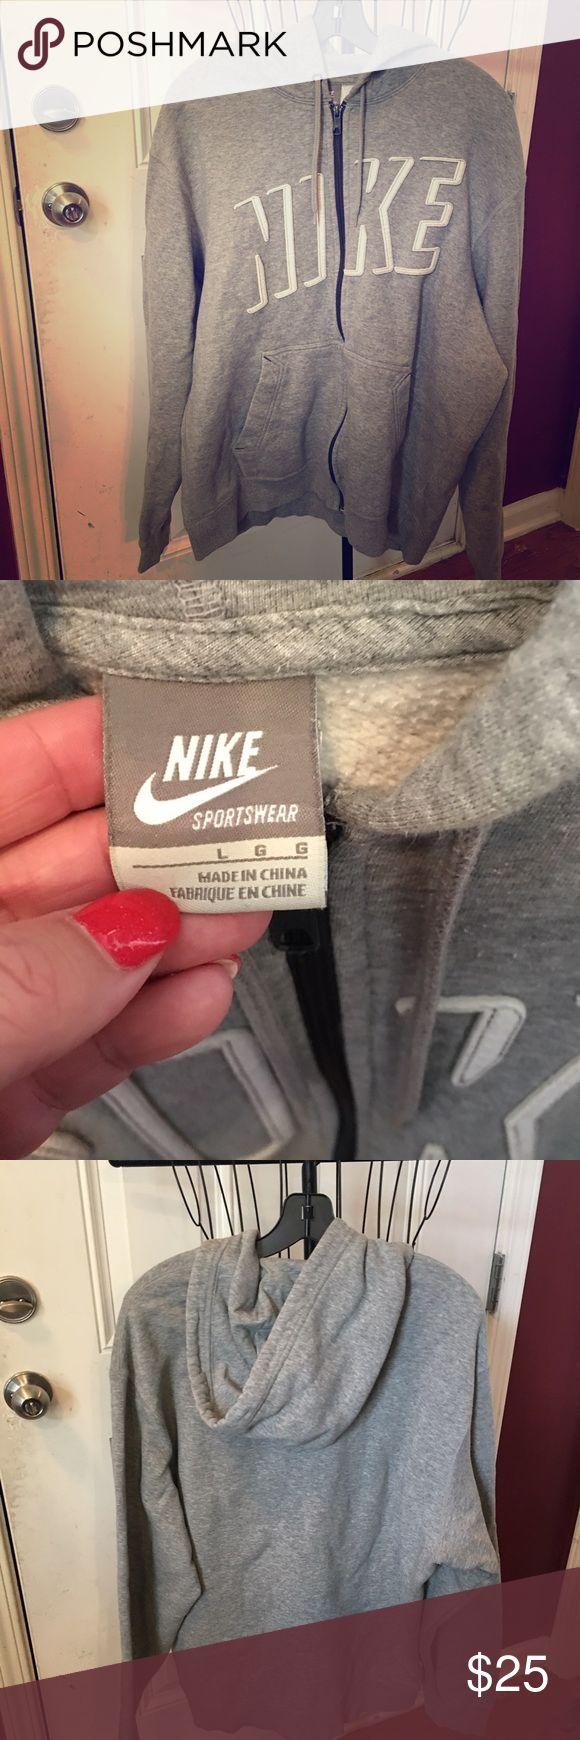 Nike zipper hoodie Nike zipper hoodie. Grey with white lettering on front. Nike Shirts Sweatshirts & Hoodies